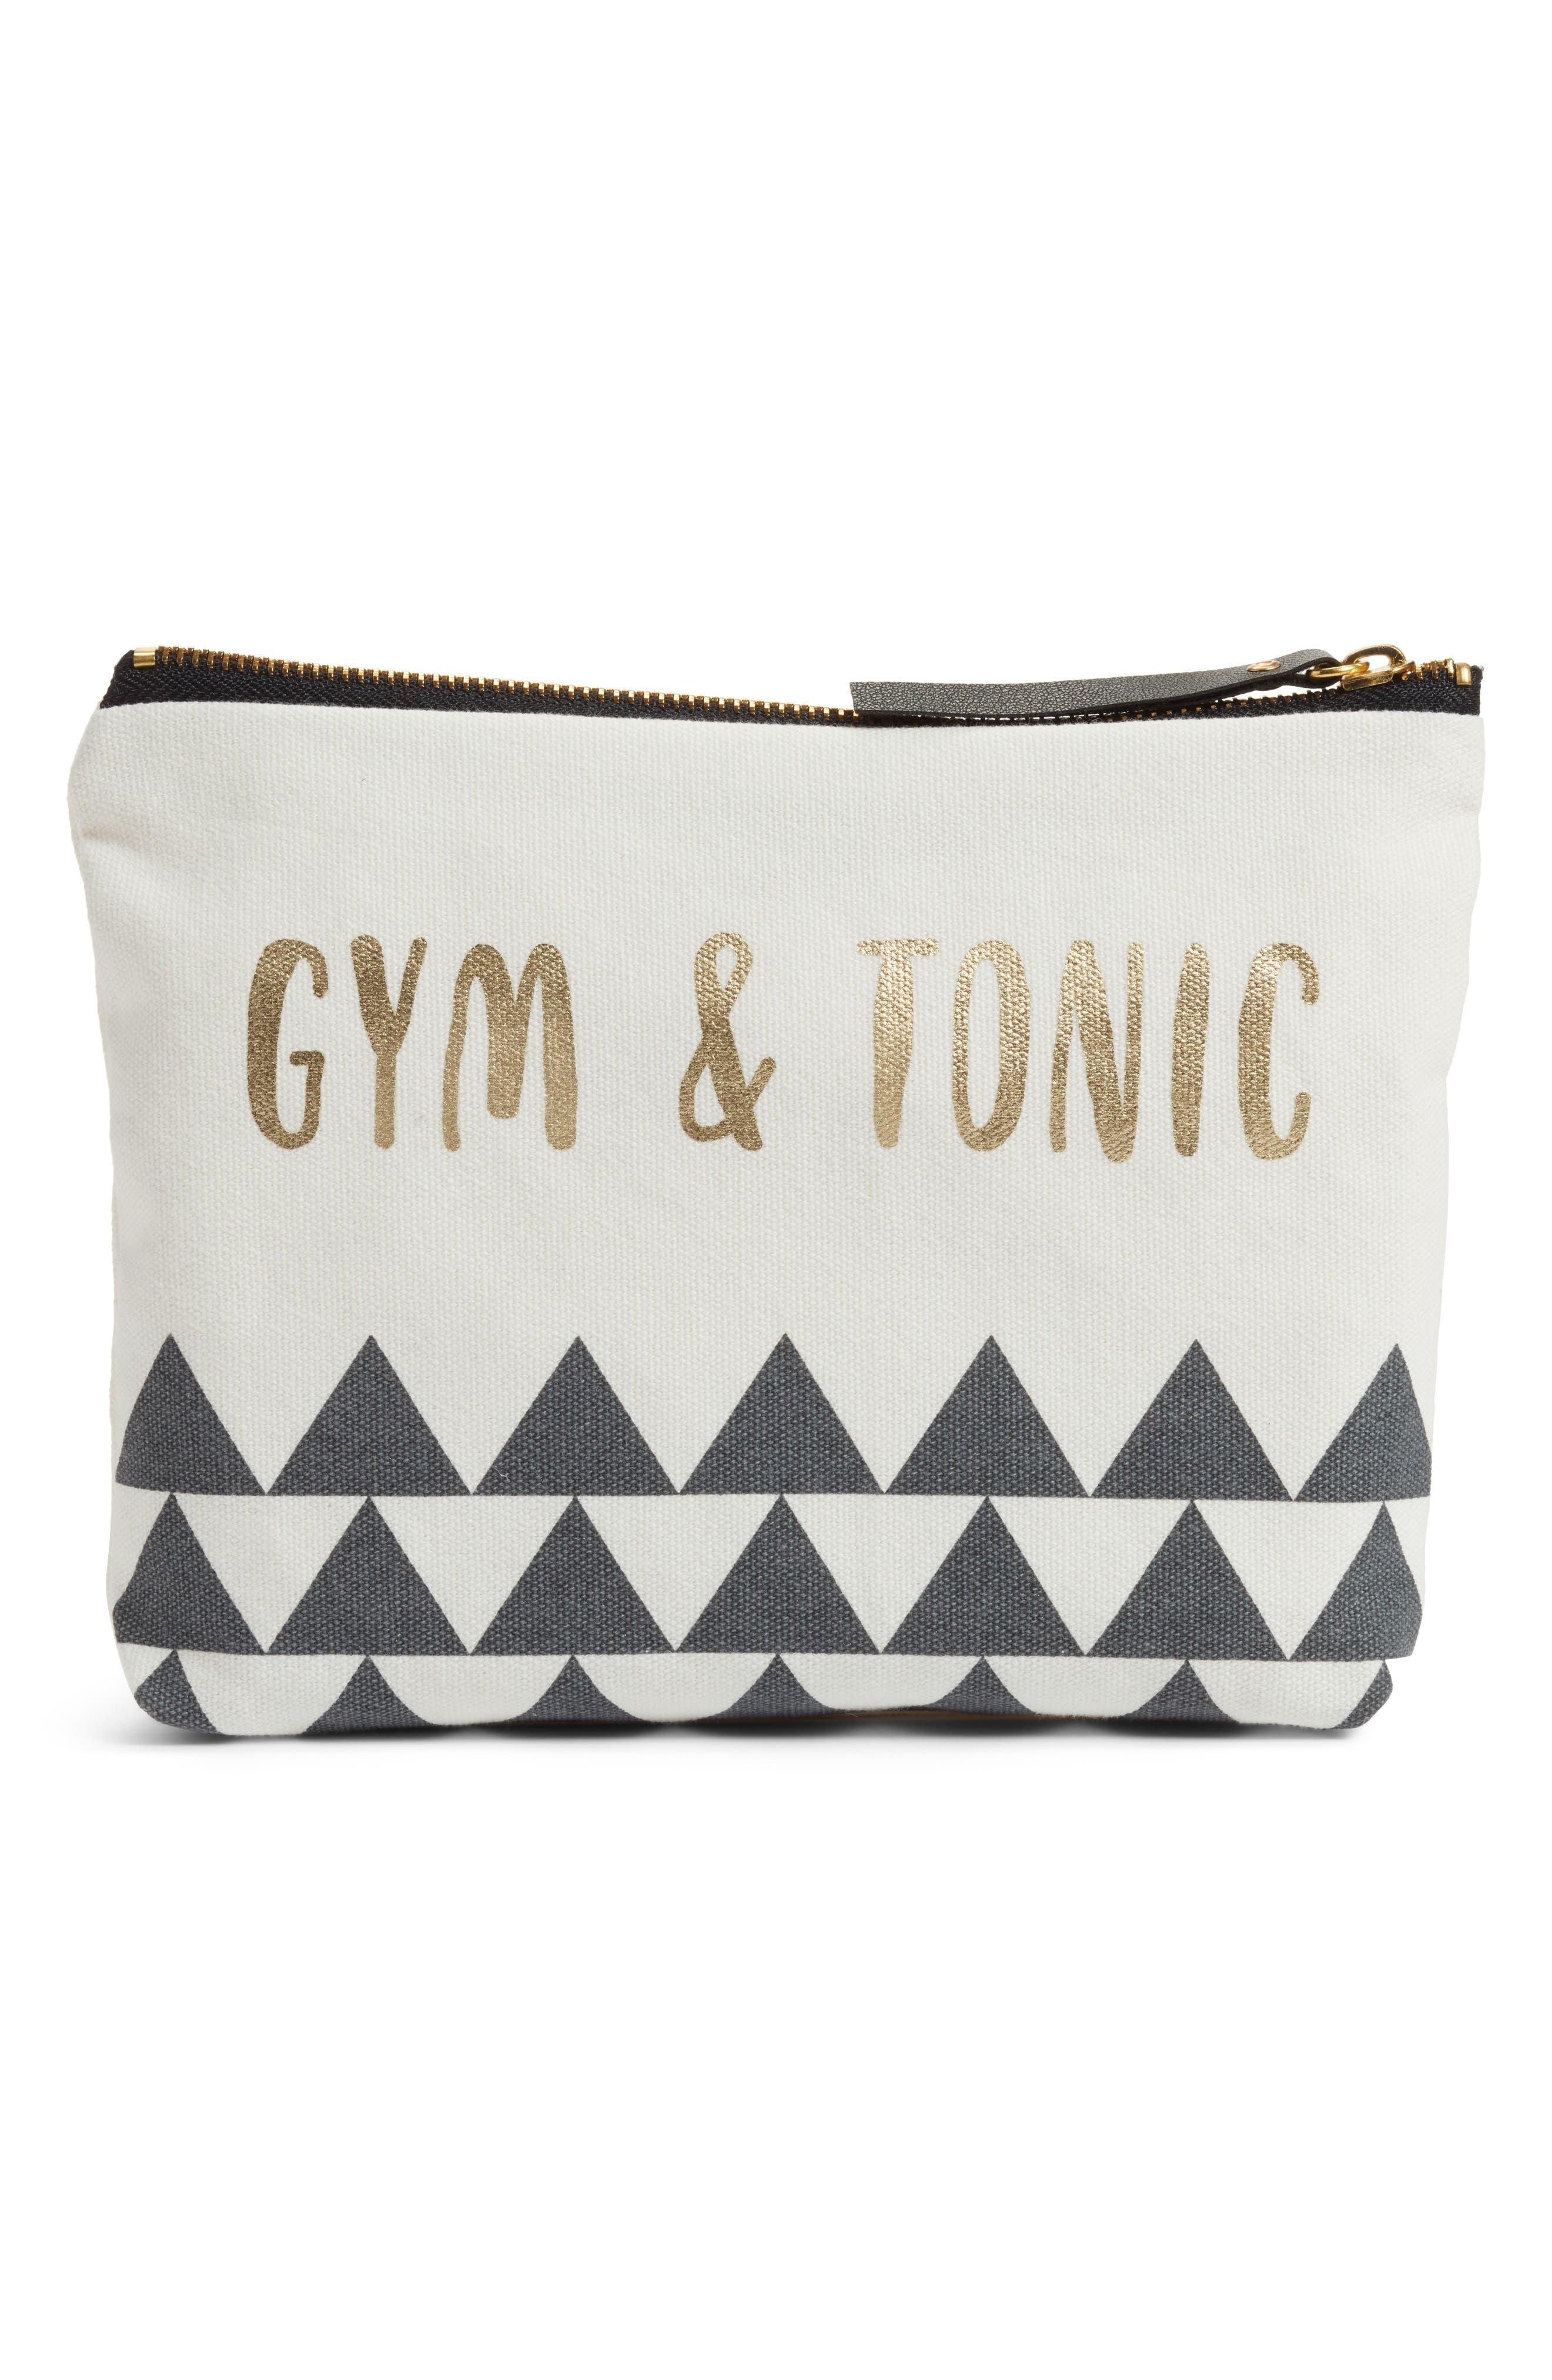 Gym & Tonic Zip Pouch,                             Main thumbnail 1, color,                             White